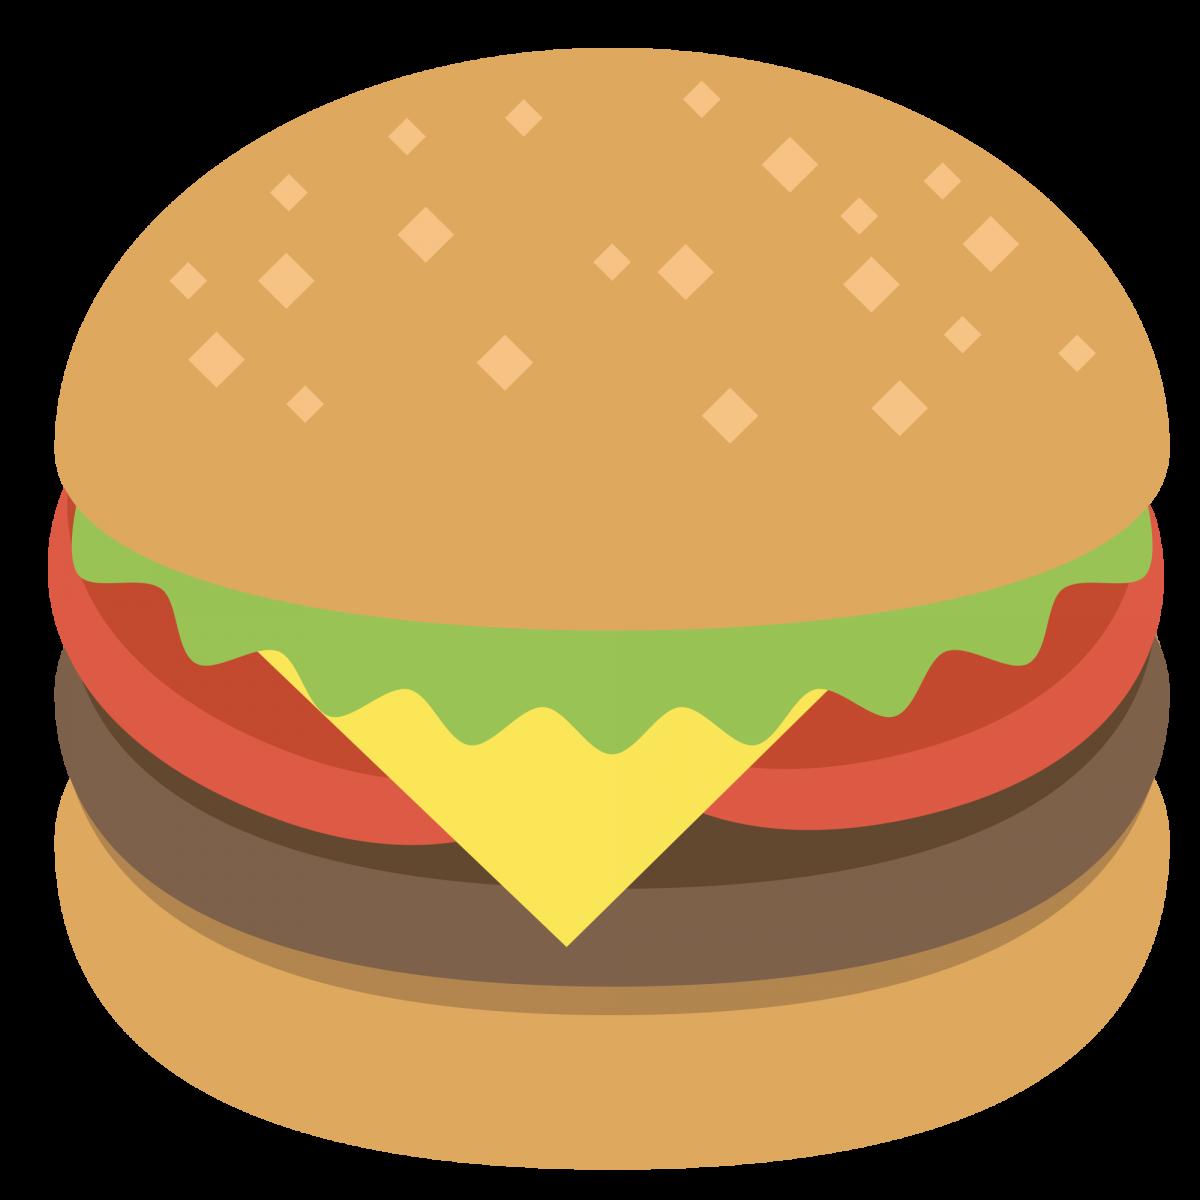 Iron on t shirt. Emoji clipart burger